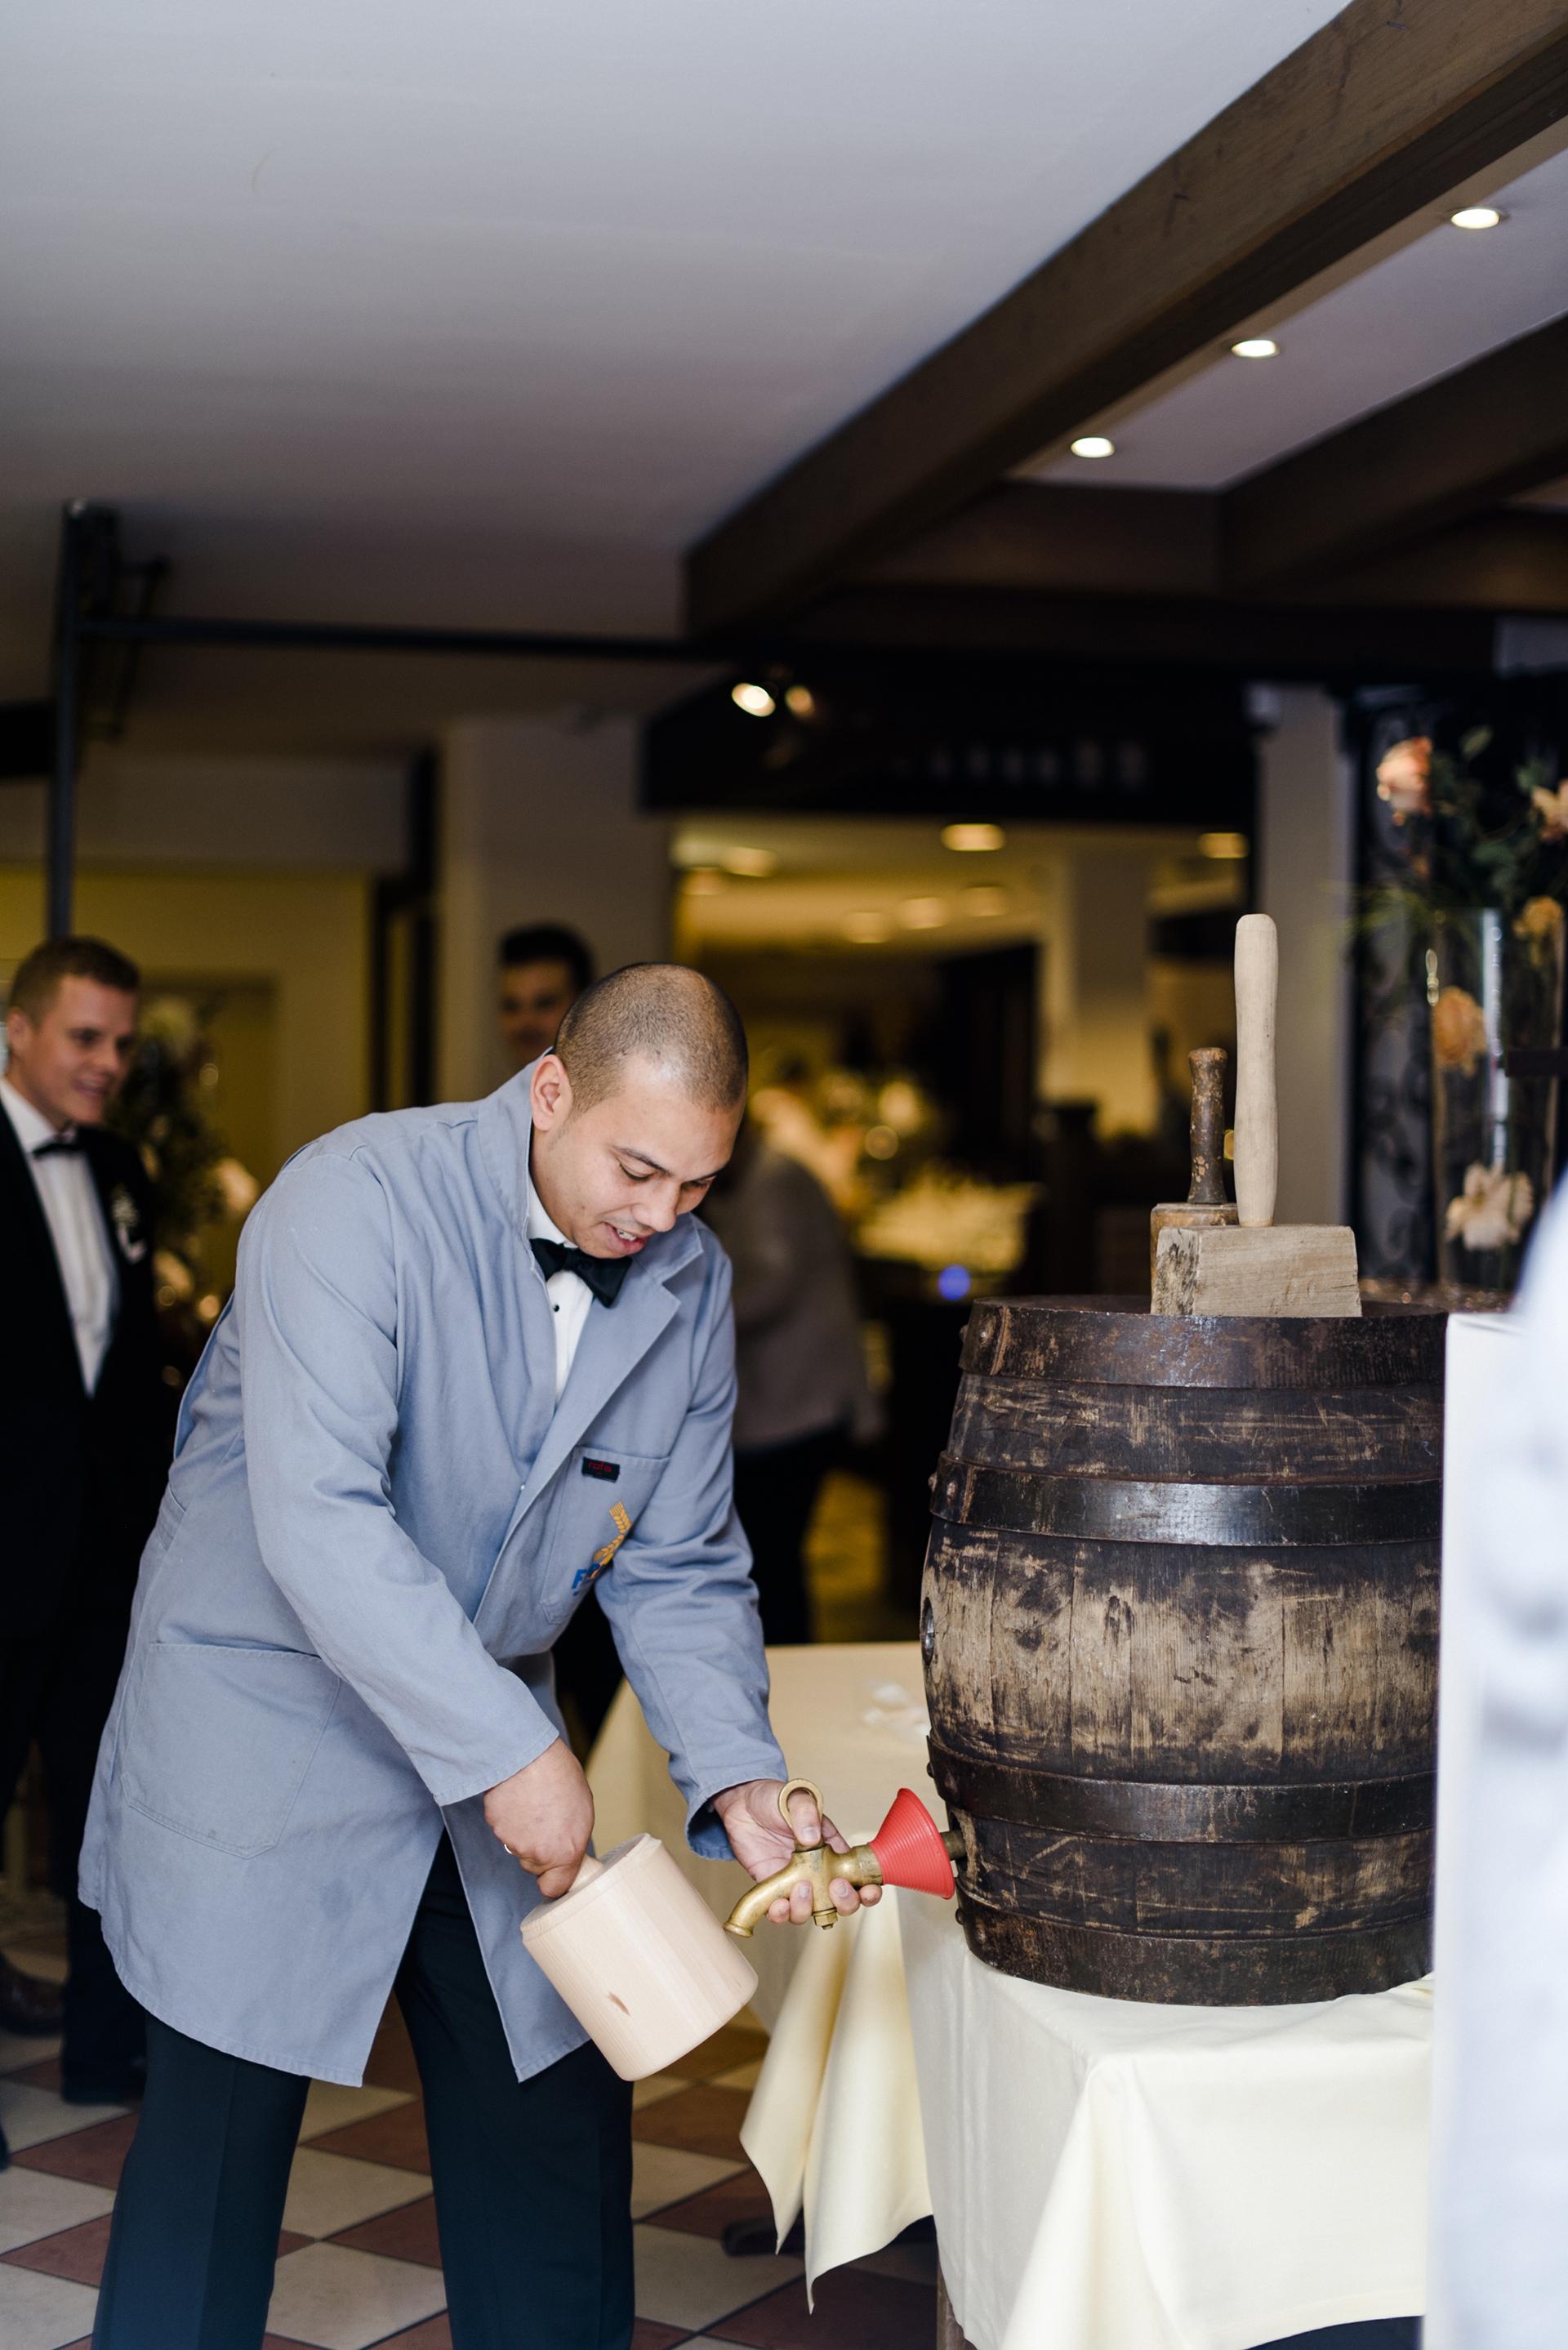 Hochzeitsreportage_J&D_075_Caroline Queda Fotografie